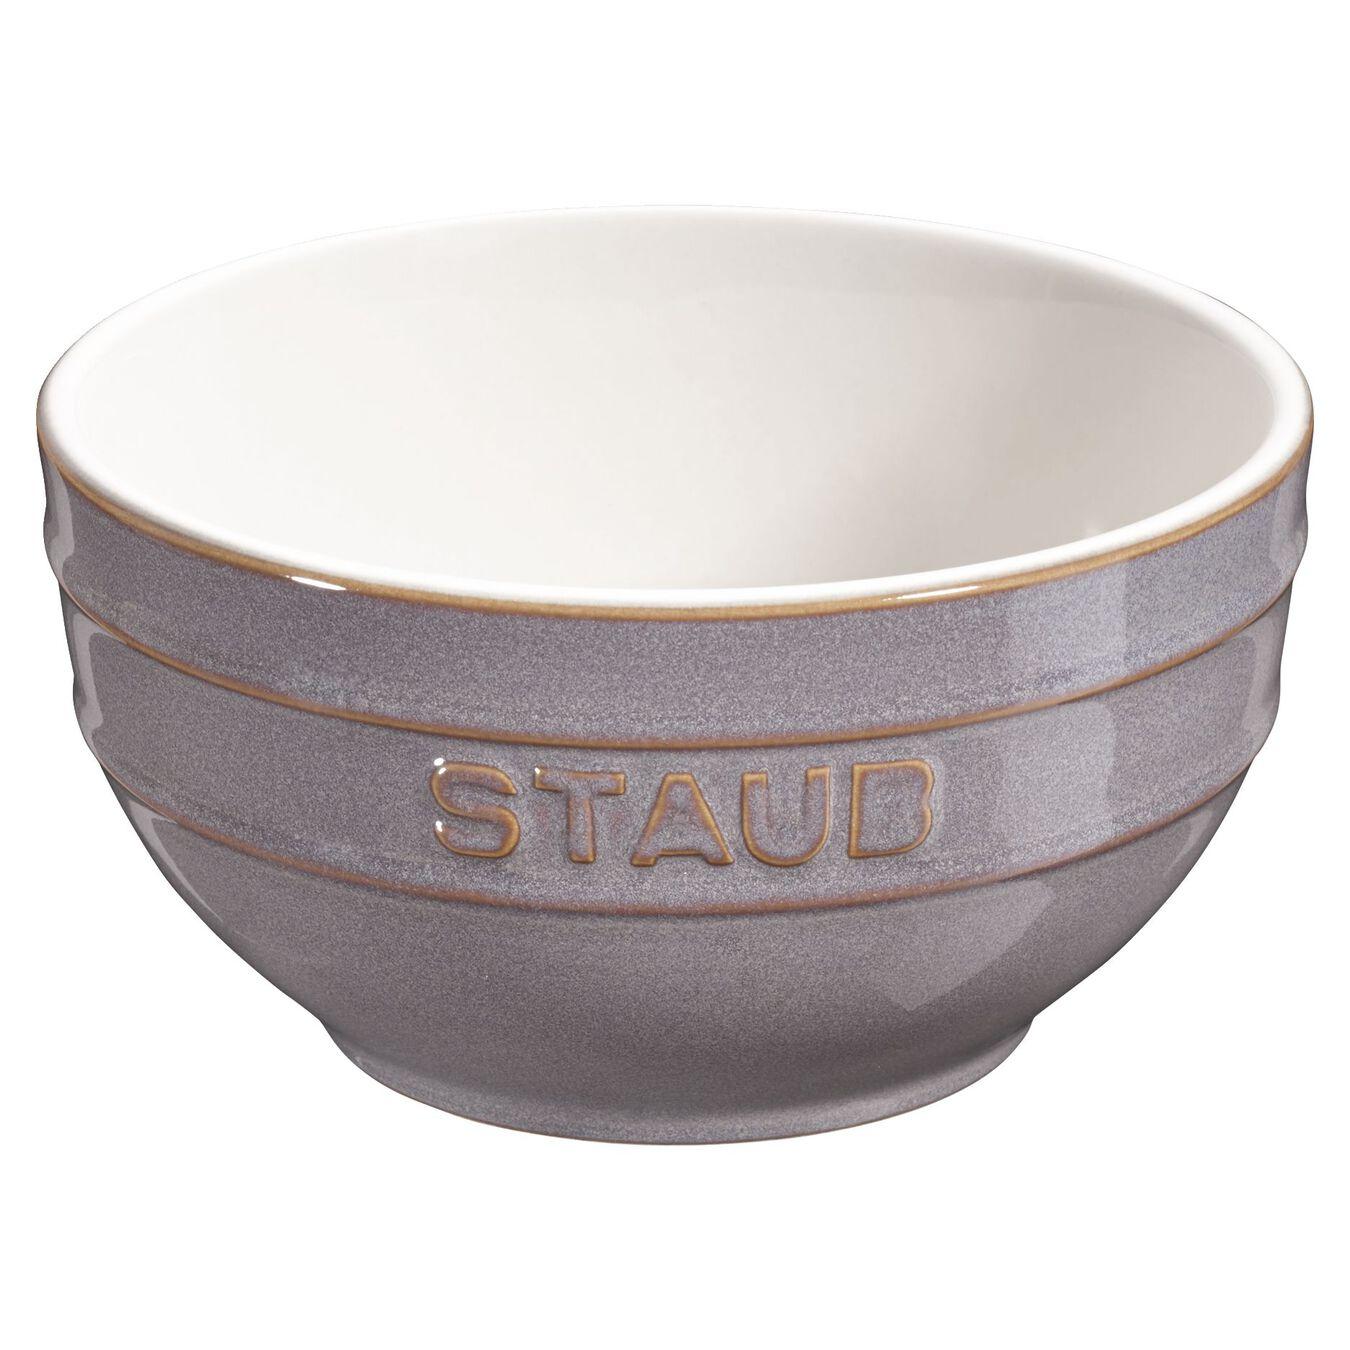 Schüssel 14 cm, Keramik, Antik-Grau,,large 1